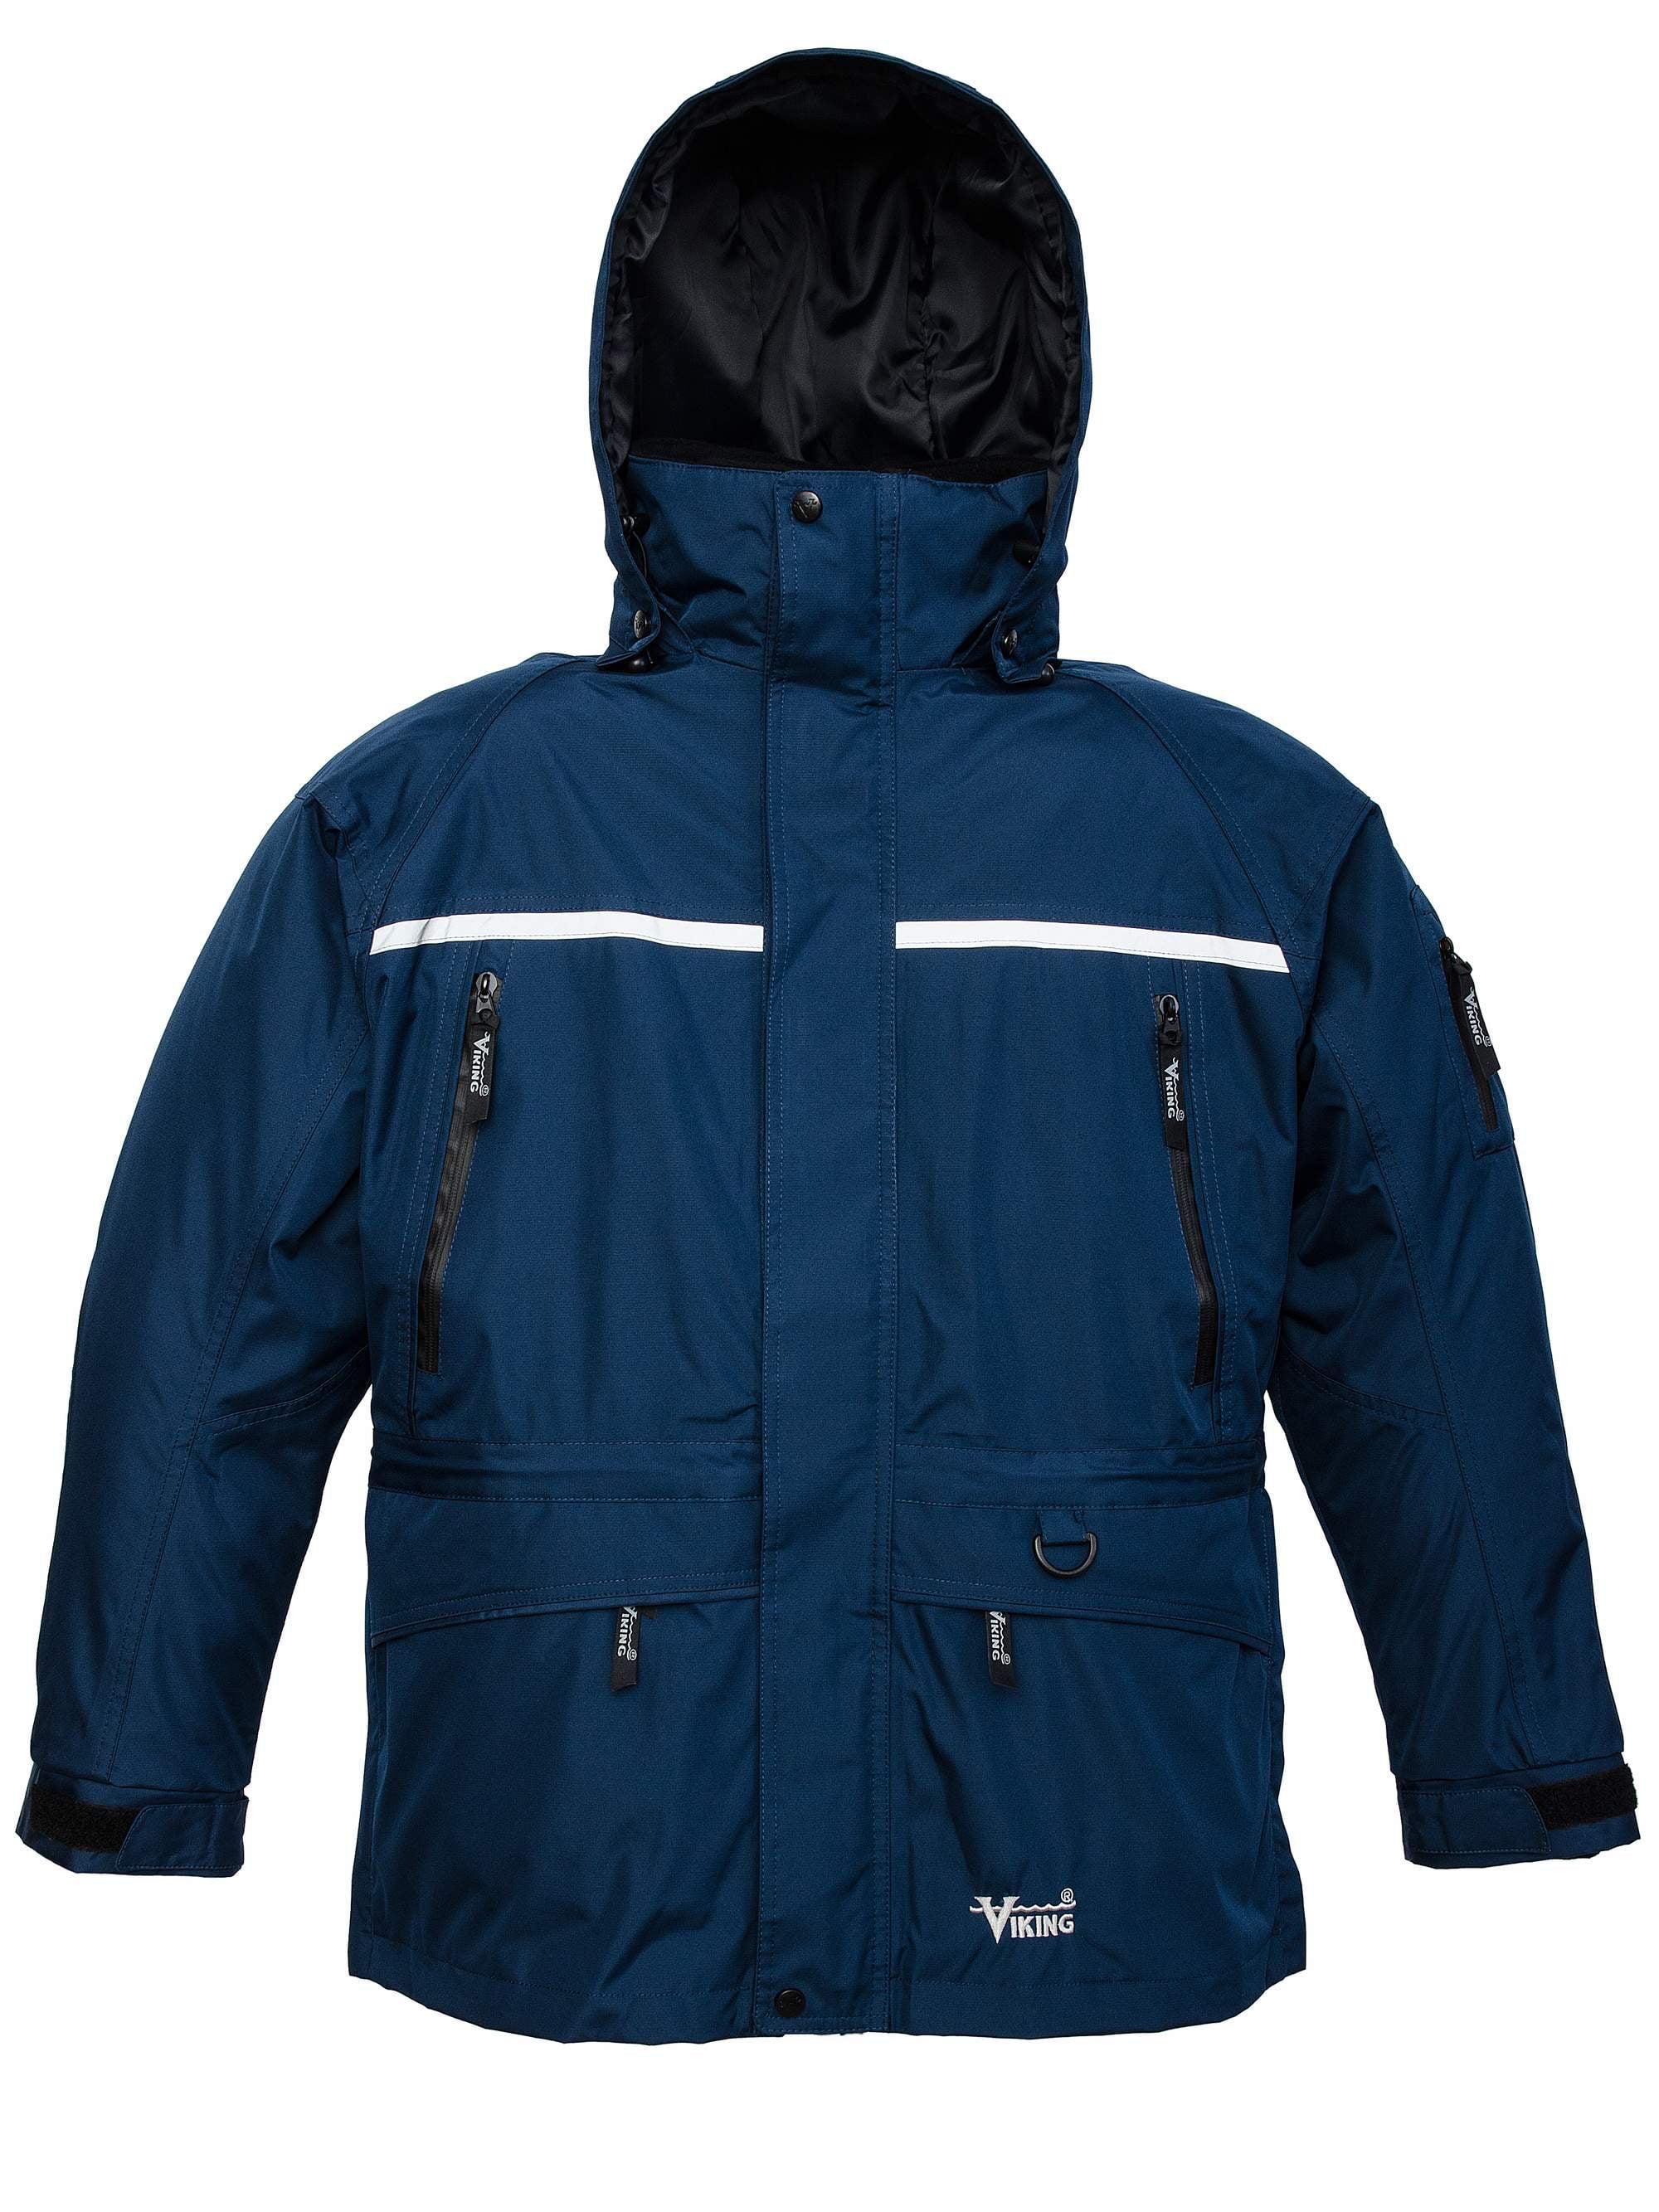 Men's Tempest TriZone Jacket